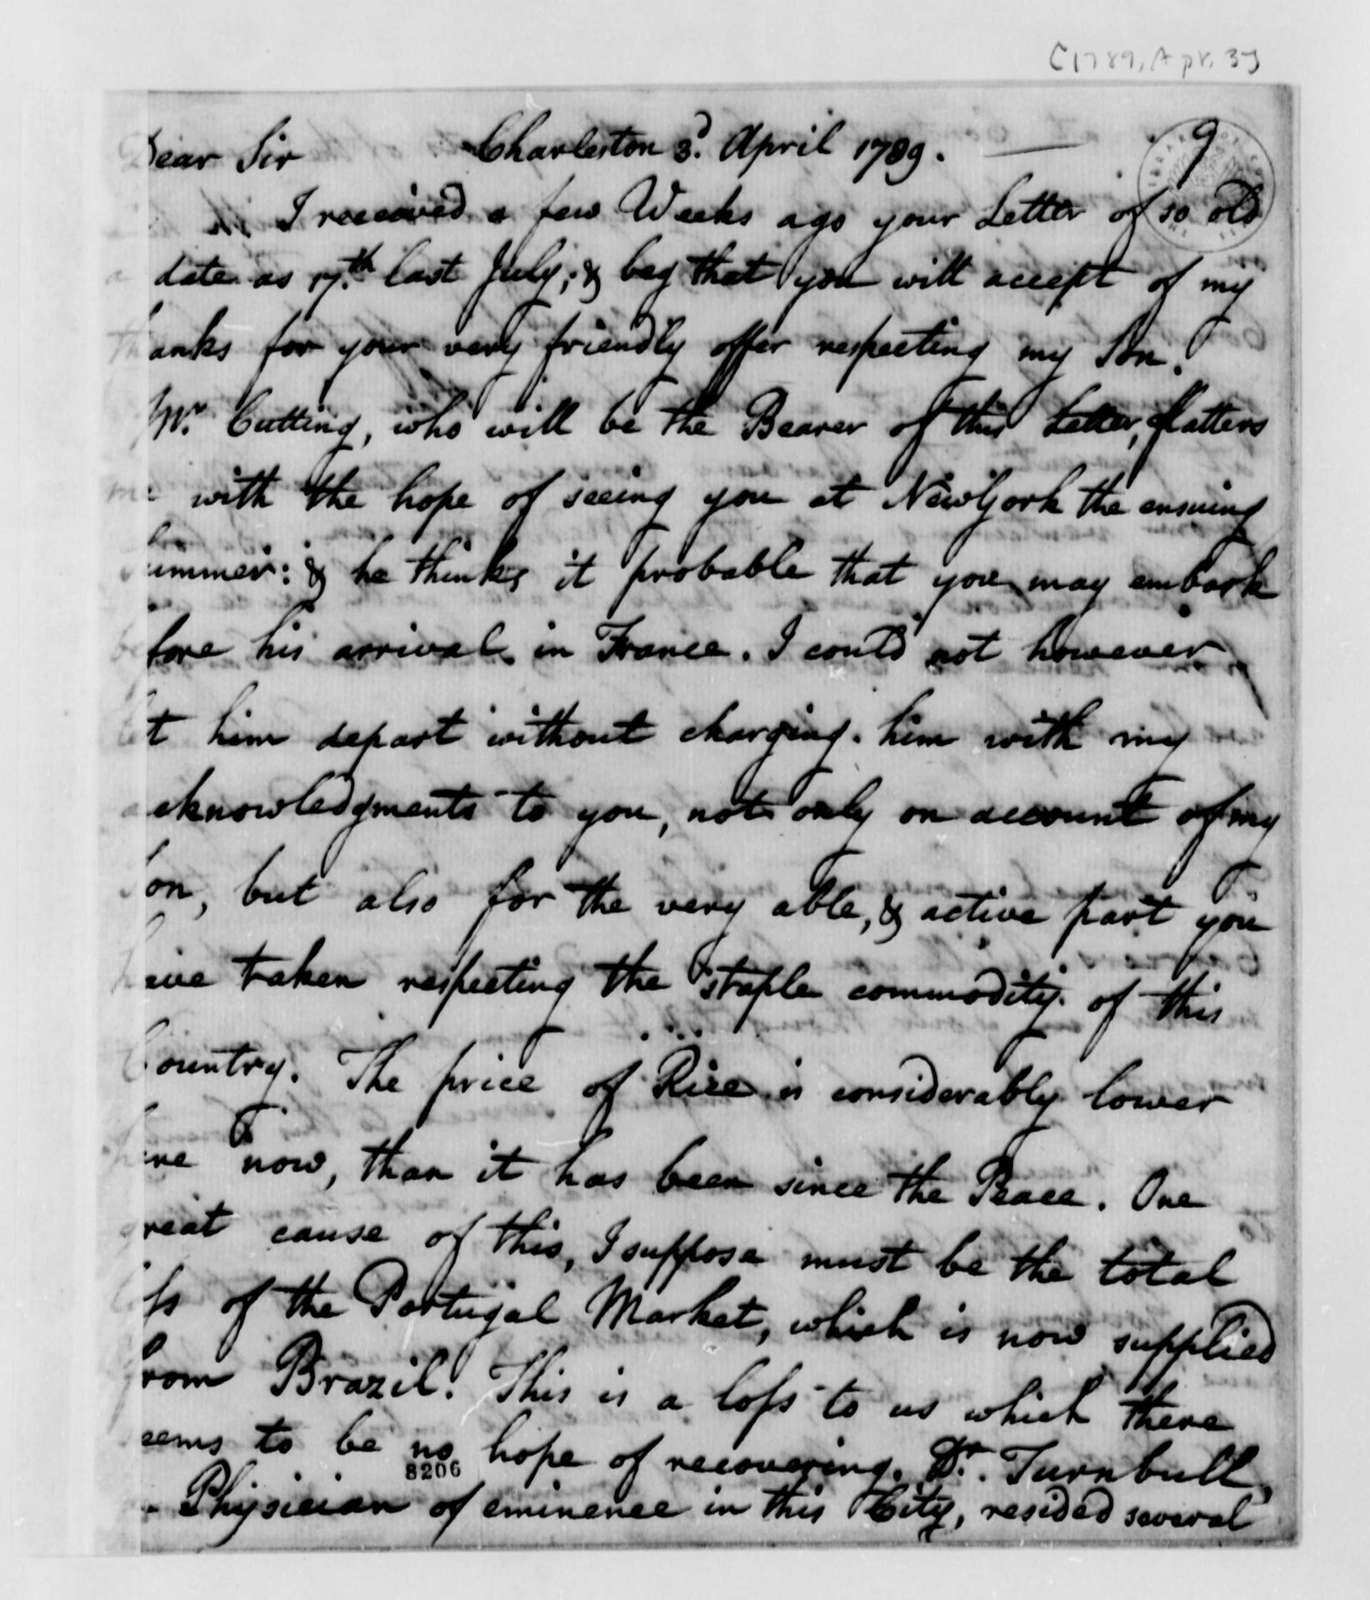 Ralph Izard to Thomas Jefferson, April 3, 1789